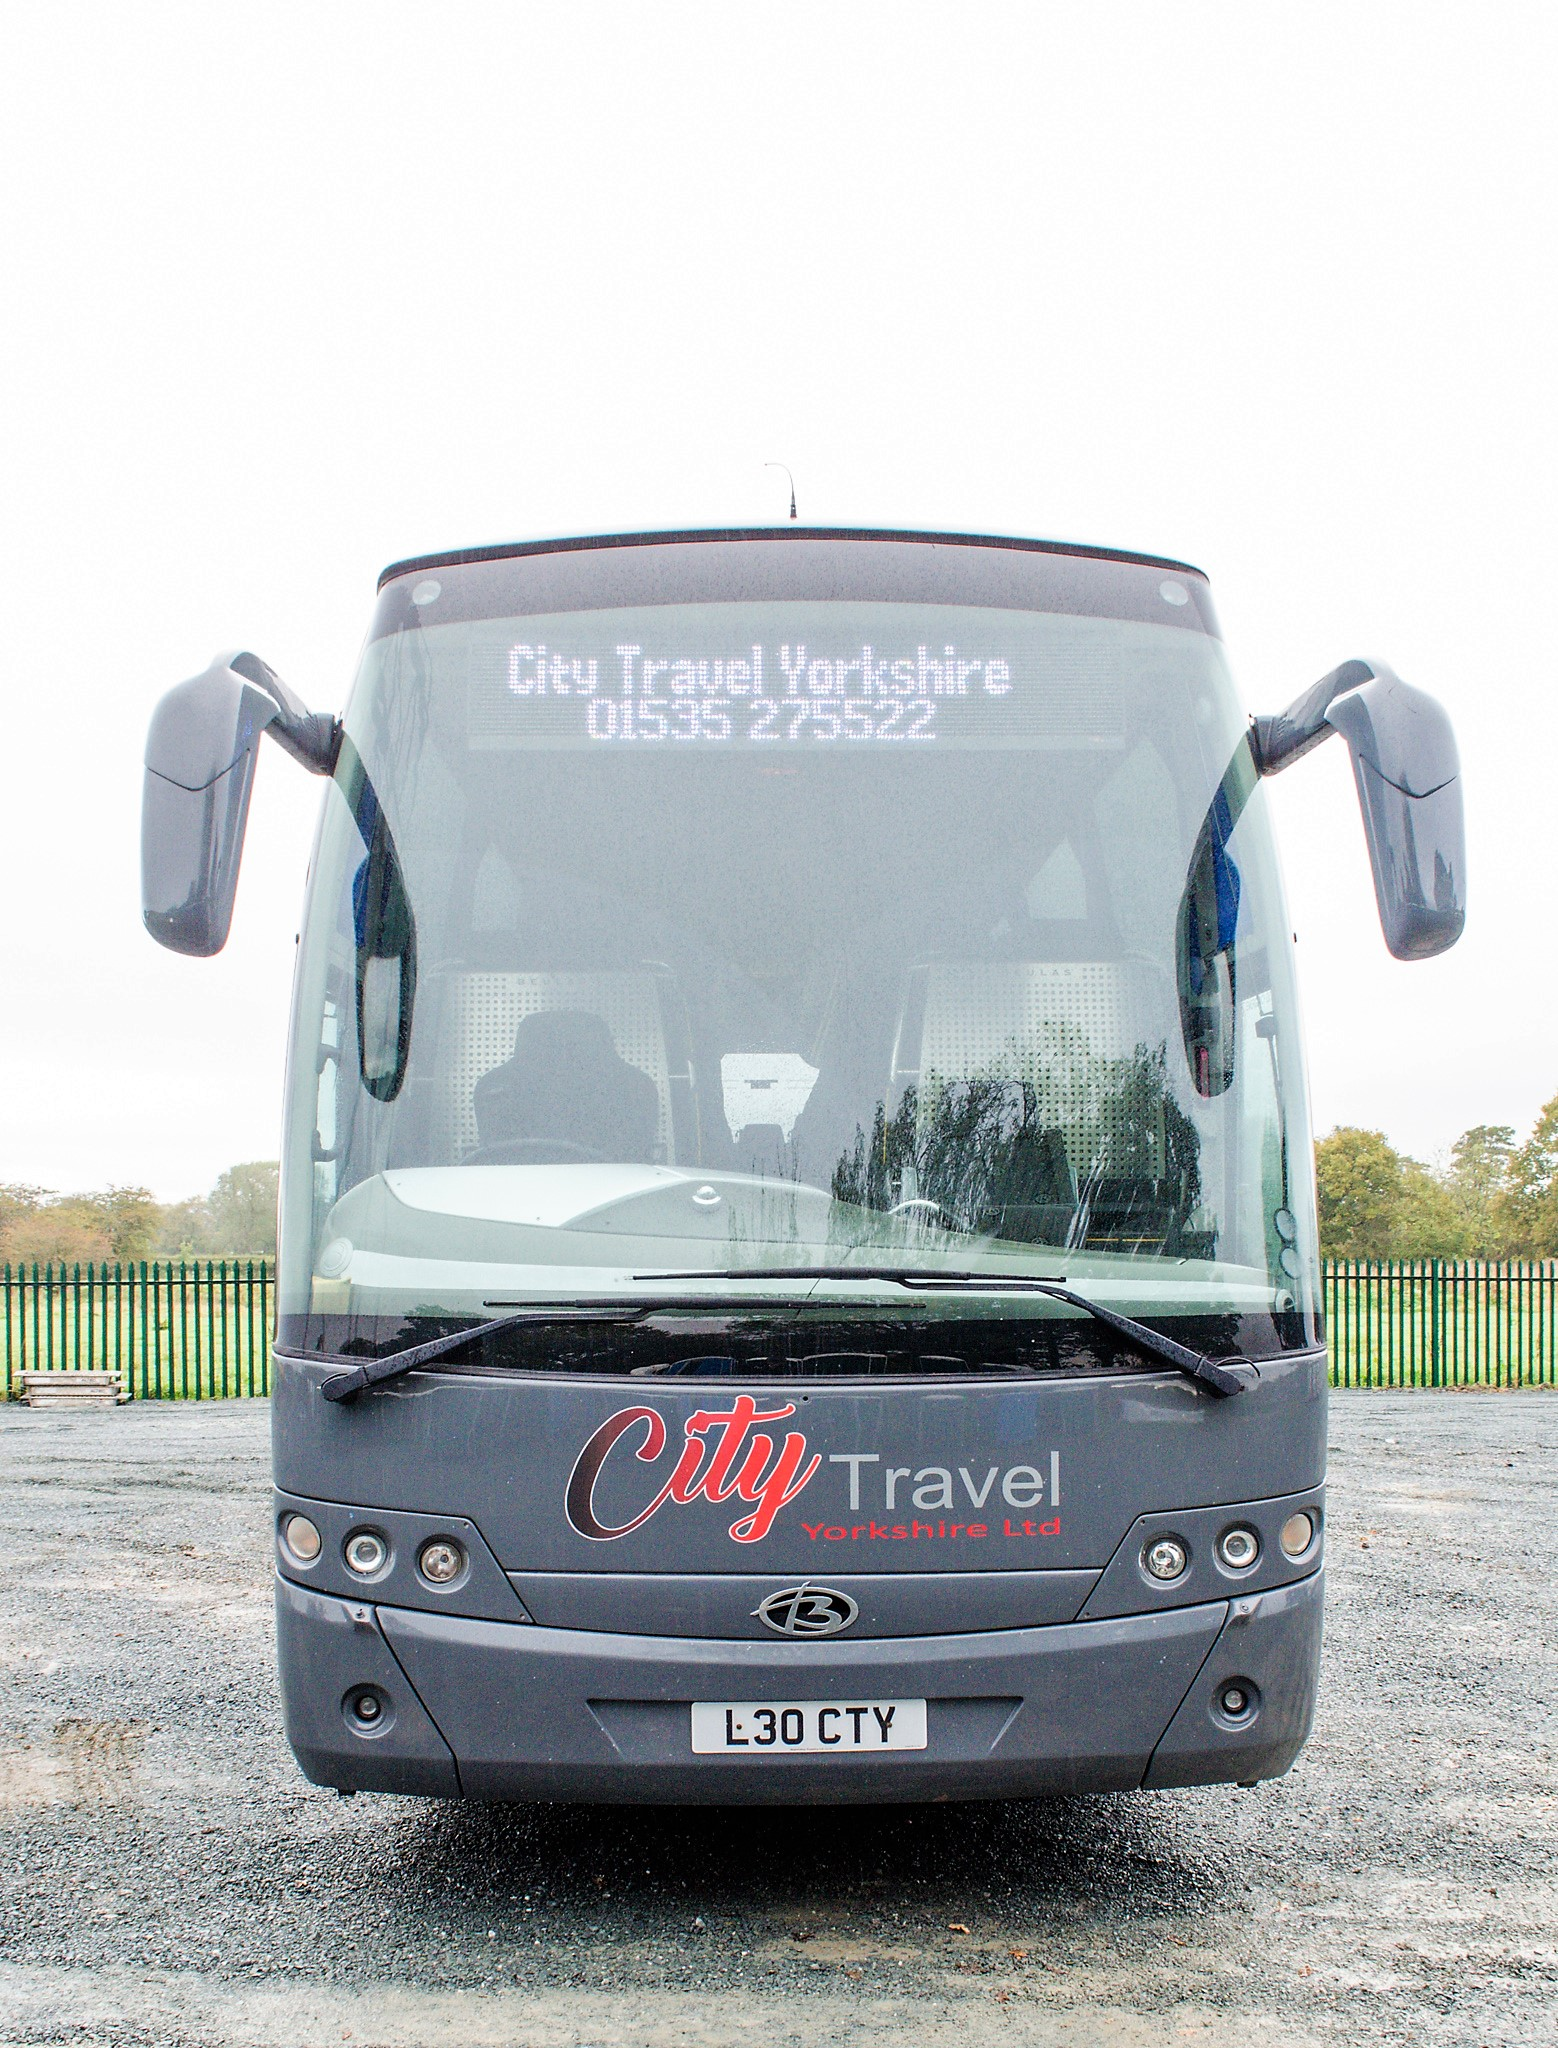 MAN F2000 Beulas Aura 54 seat luxury coach Registration Number: KC08 KTC Date of Registration: 30/ - Image 5 of 19